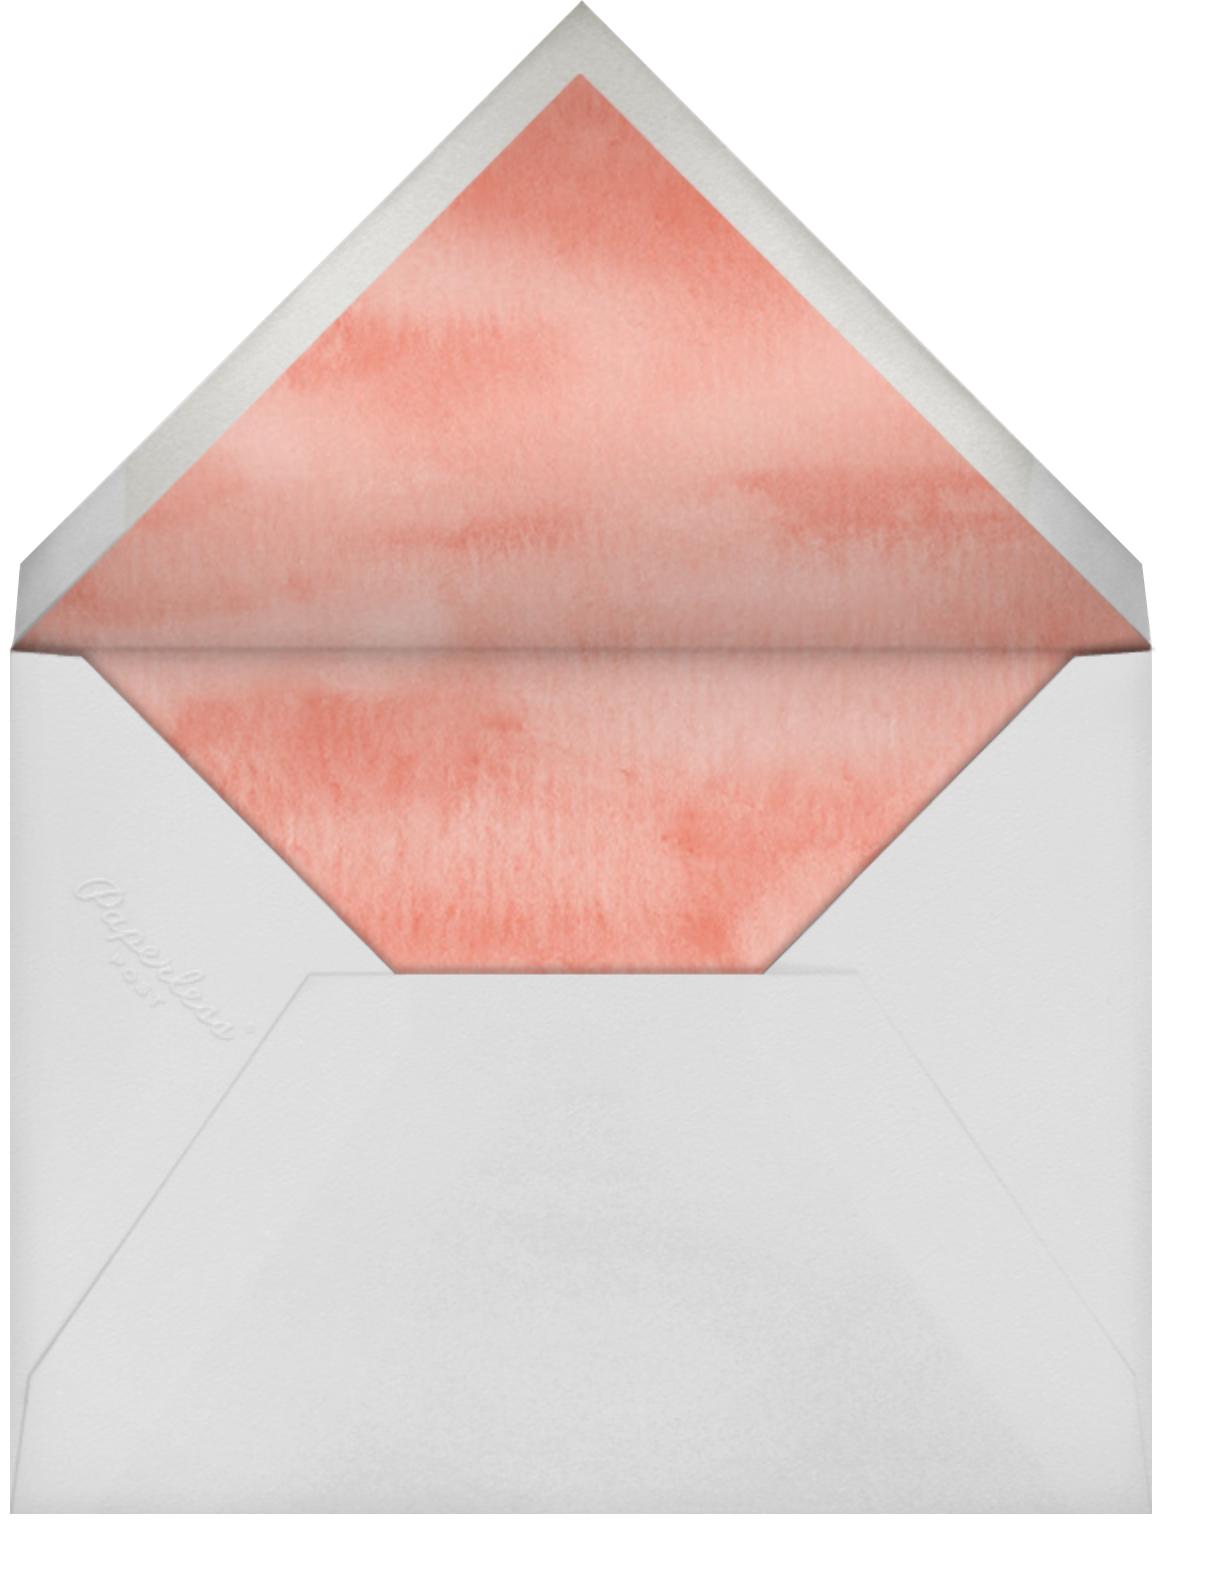 Something Bridal - Paperless Post - Bridal shower - envelope back